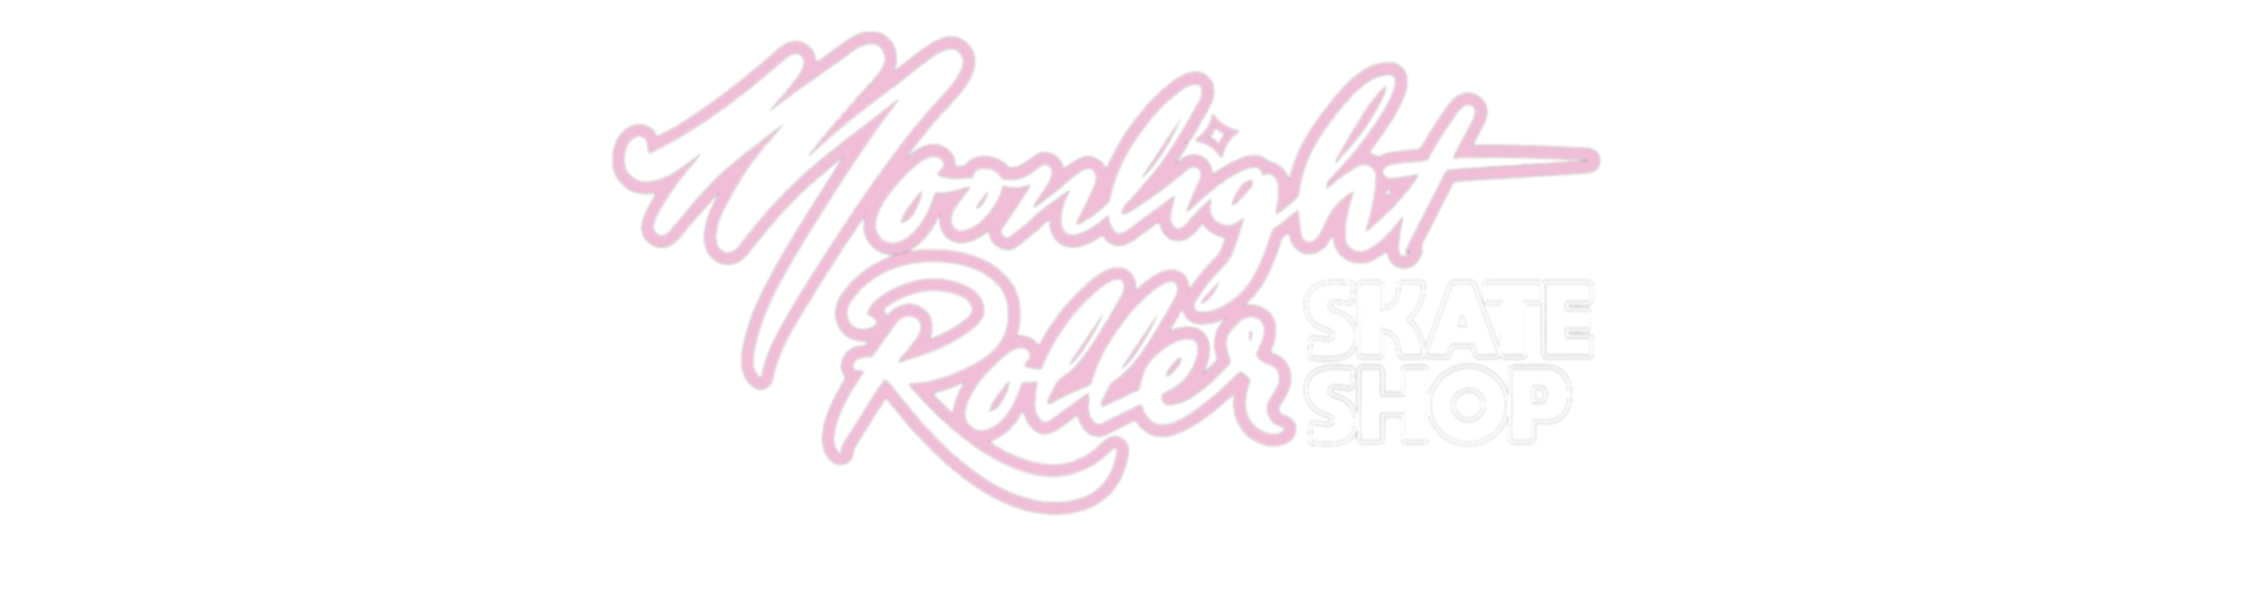 Moonlight Roller Skate Shop